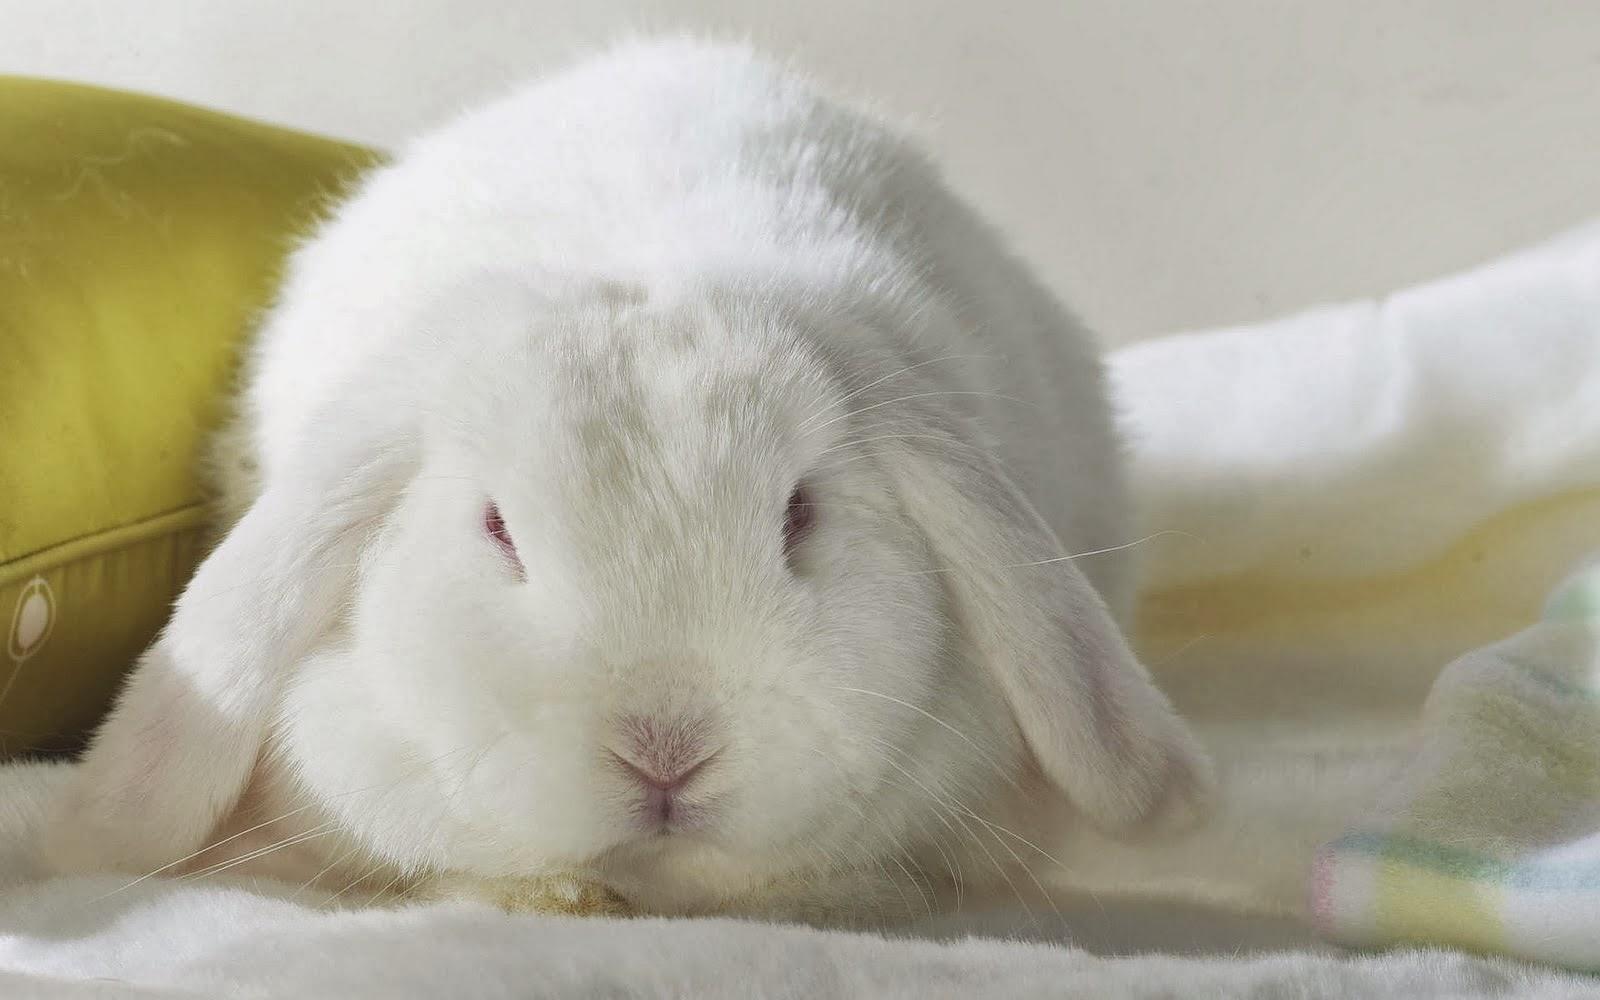 Cute 3d Wallpapers Rabbit Desktop Hd Wallpapers Free Downloads Beautiful Baby